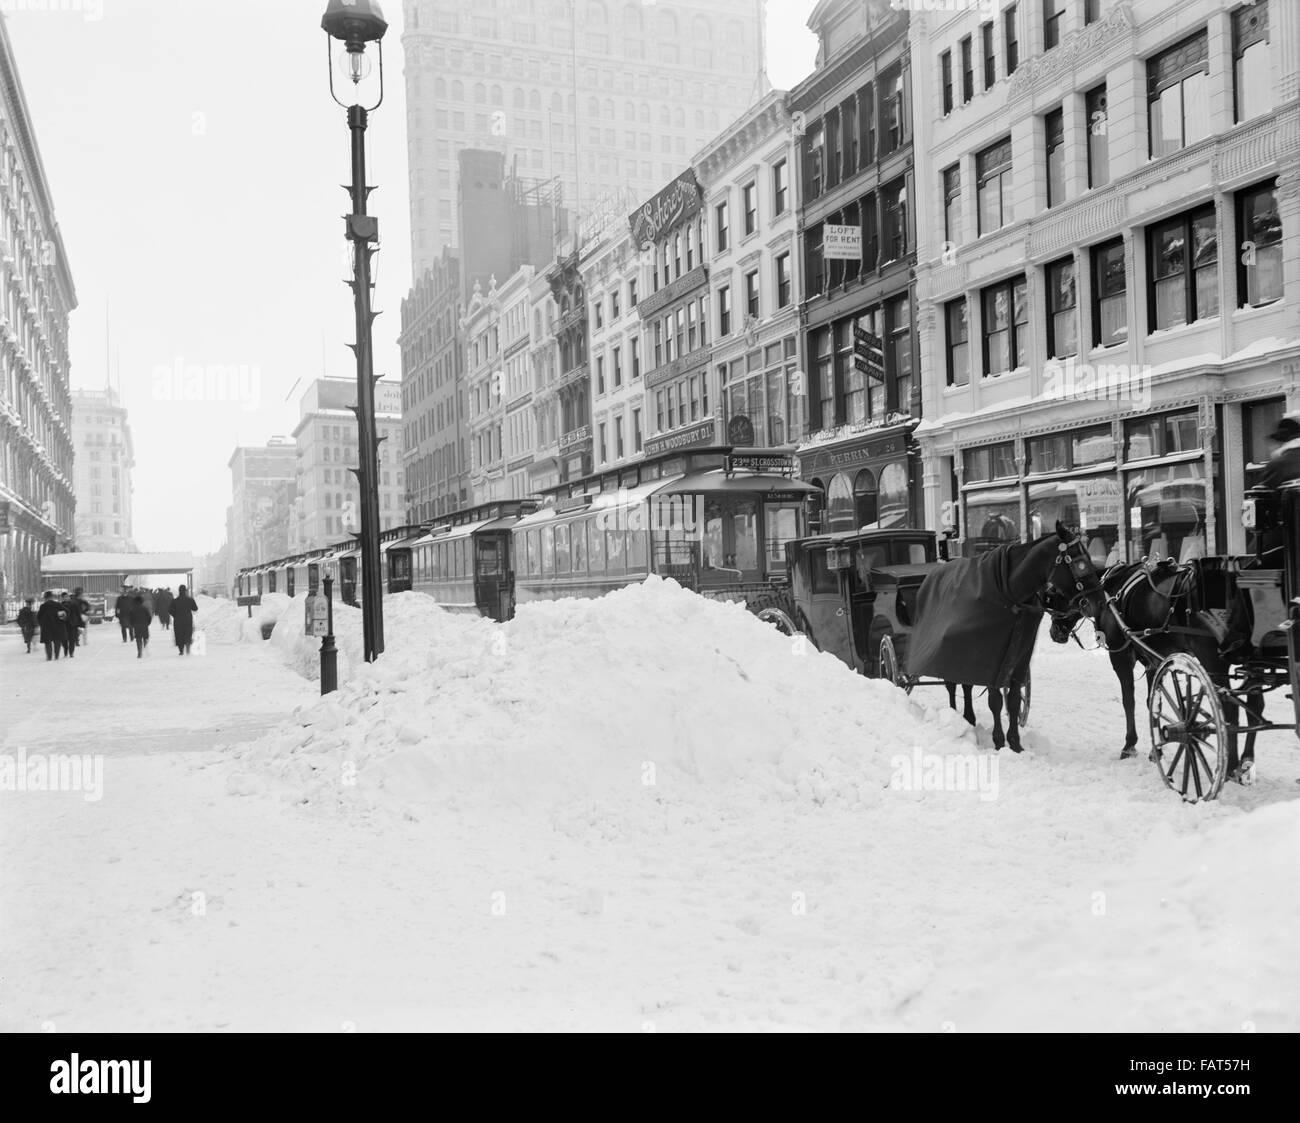 Blockaded Transportation after Snow Storm,  23rd Street, New York City, USA, circa 1905 - Stock Image